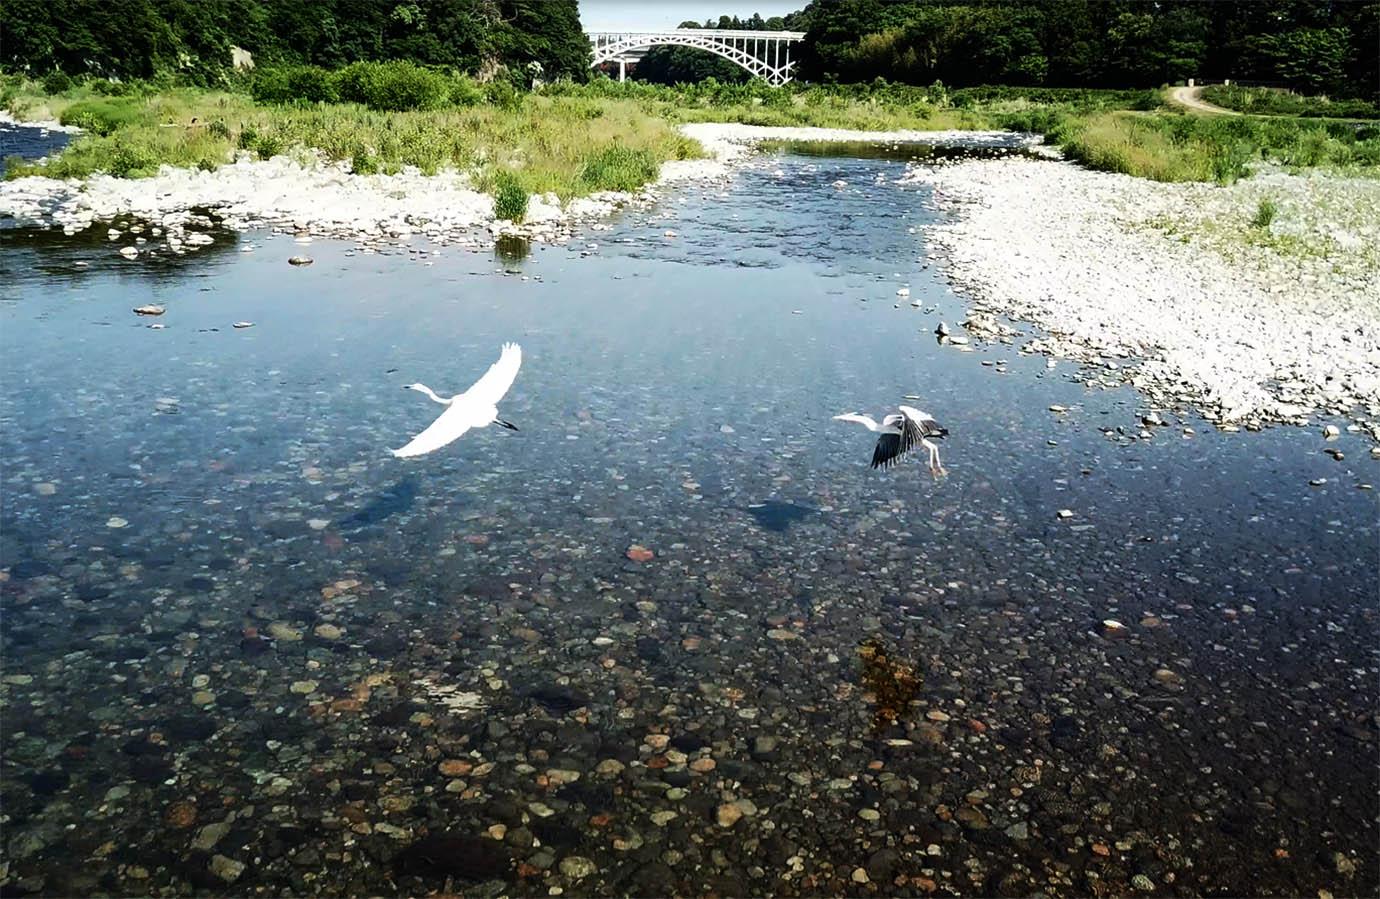 drone-superb-view-kuroiso-nakagawa9